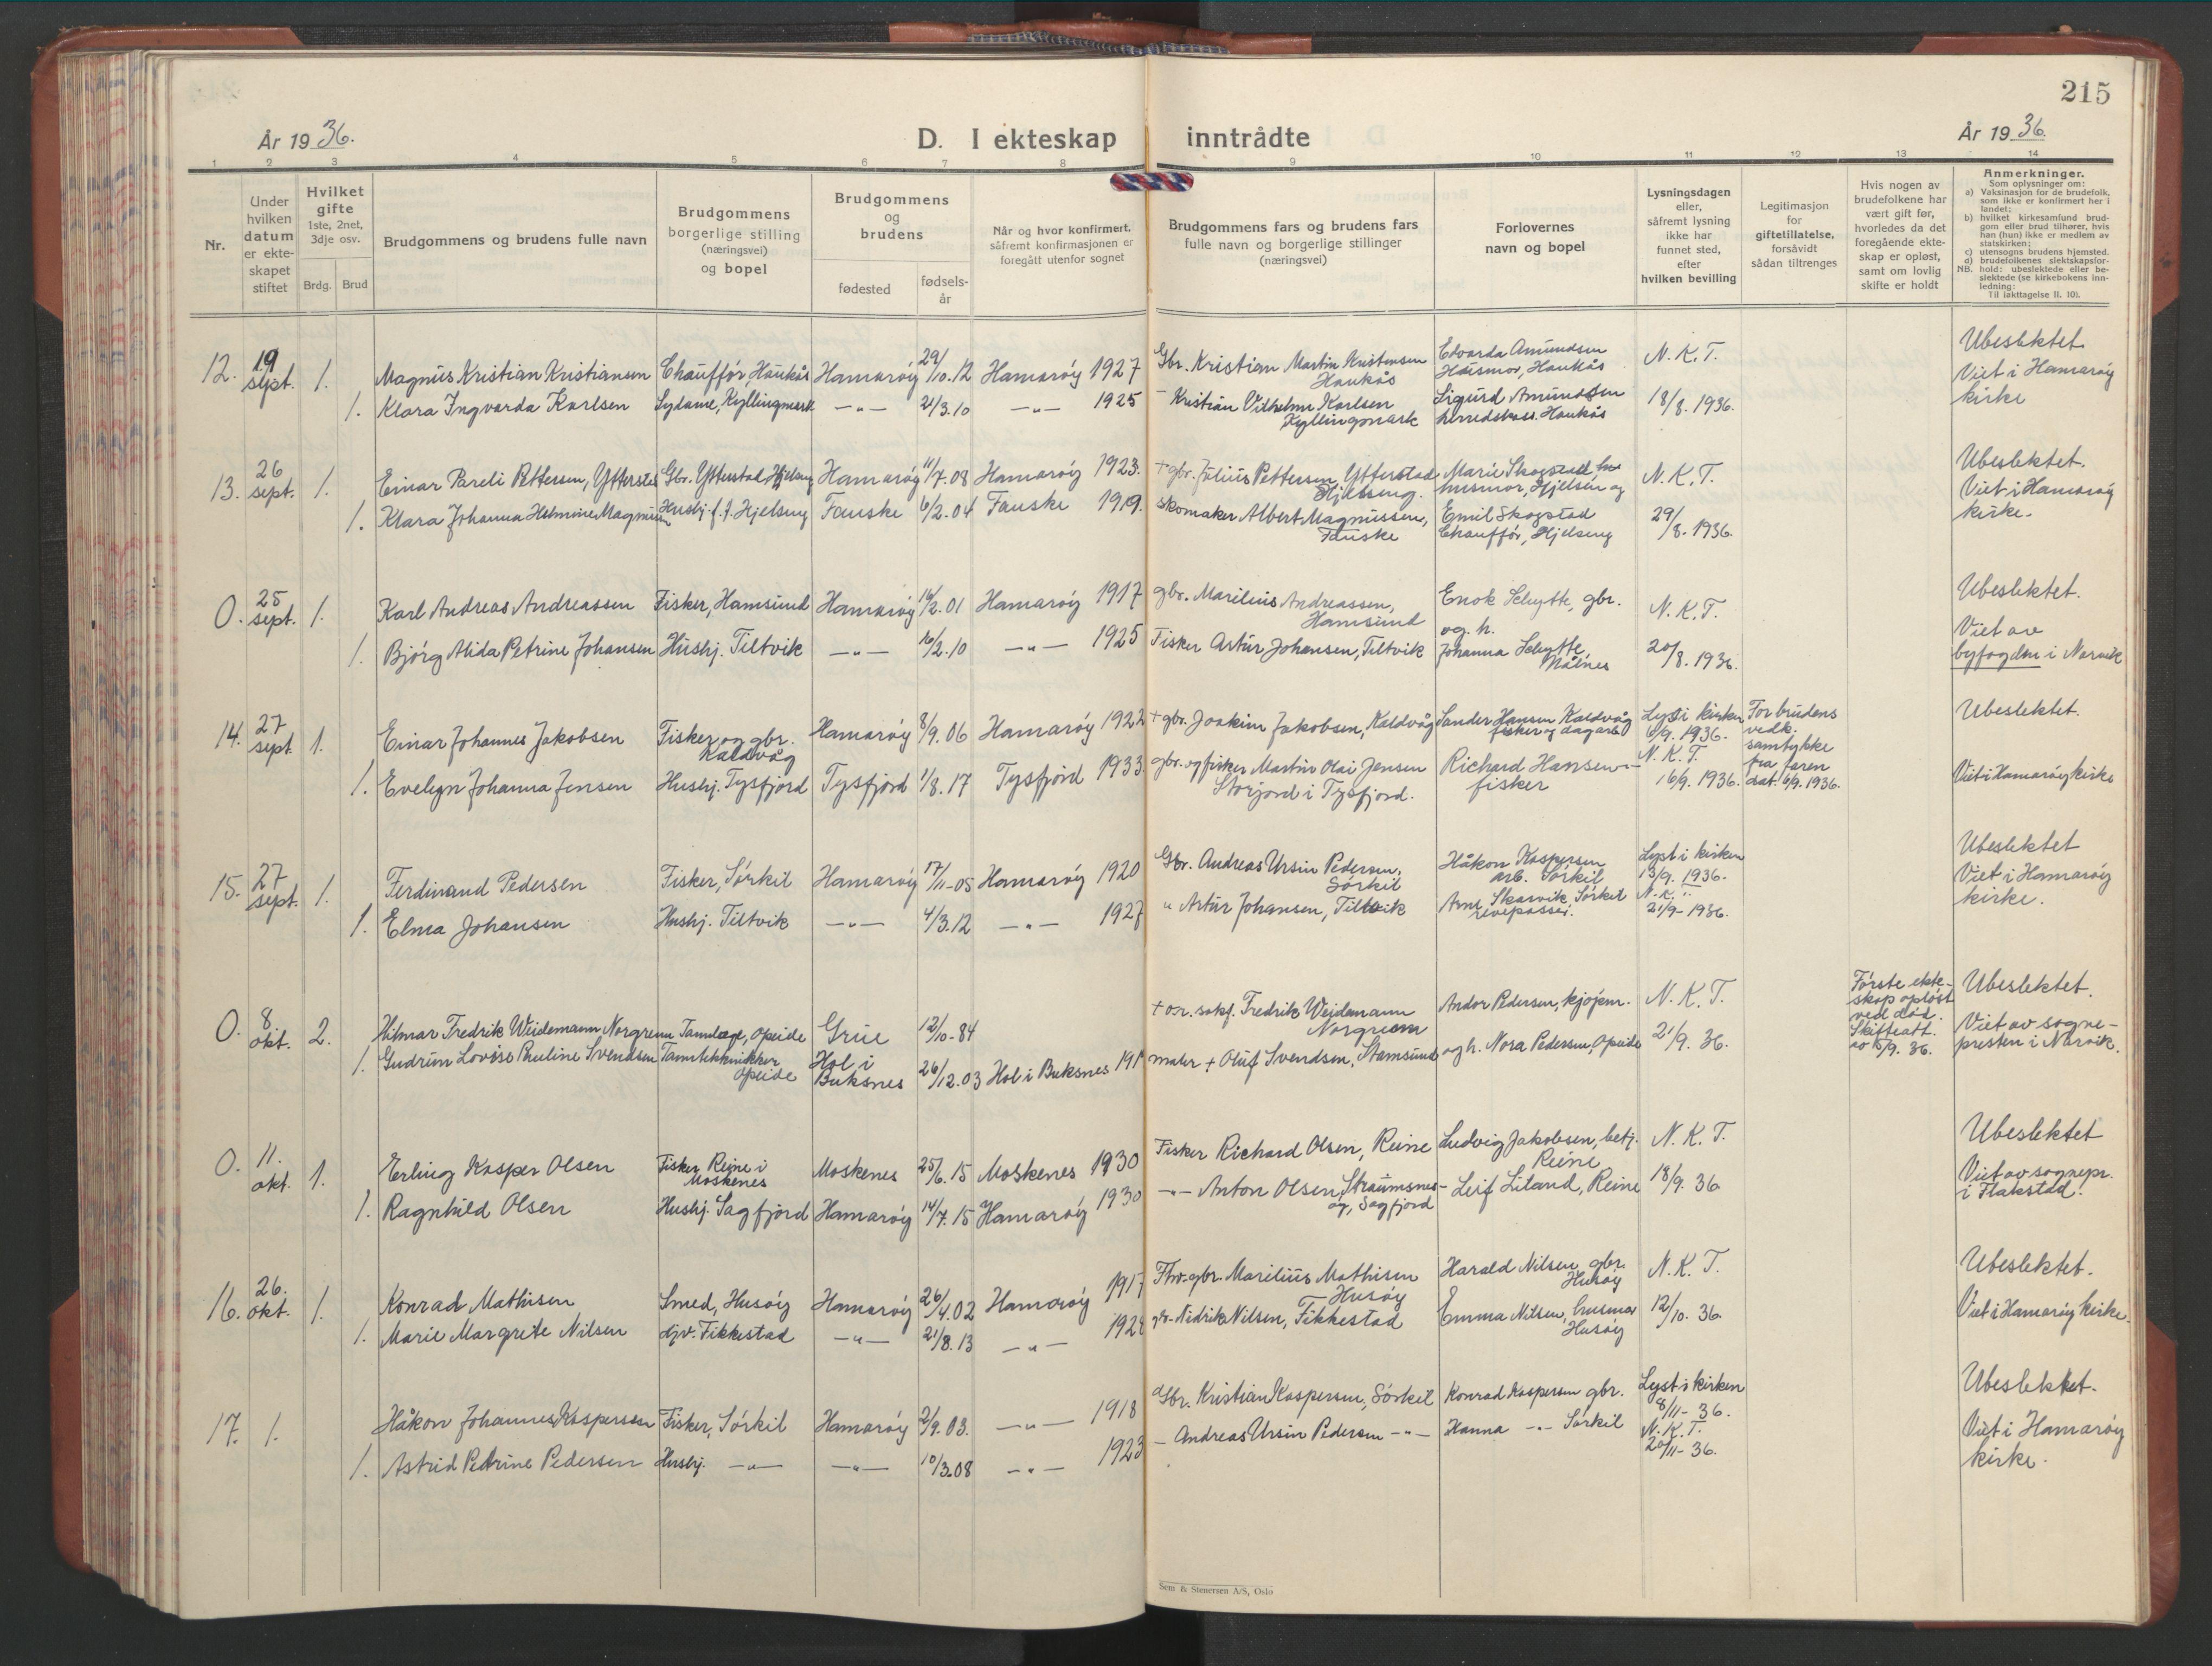 SAT, Ministerialprotokoller, klokkerbøker og fødselsregistre - Nordland, 859/L0862: Klokkerbok nr. 859C08, 1925-1936, s. 215